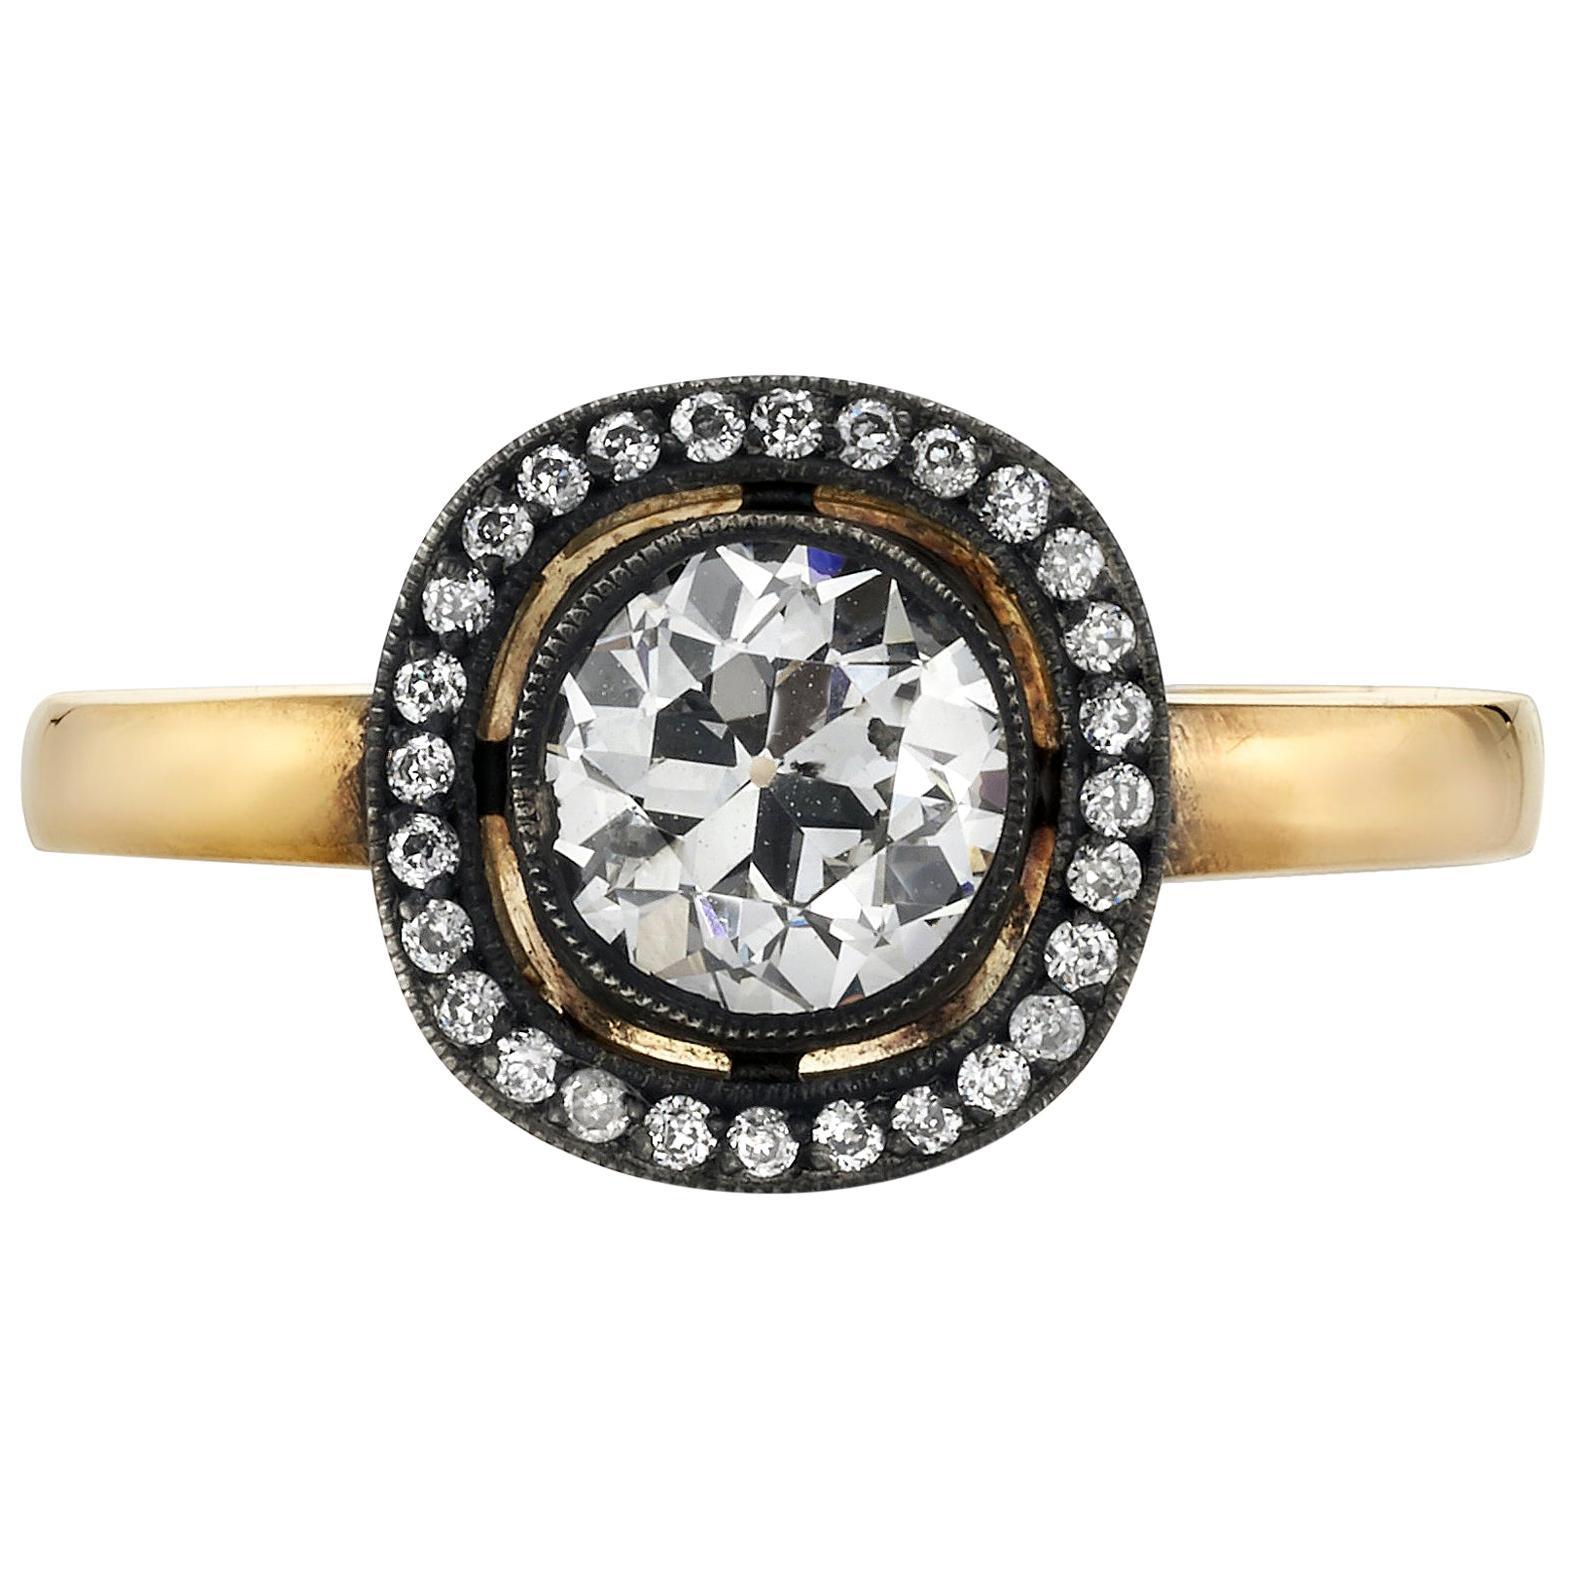 0.85 Carat Old European Cut Diamond Set in a Rose Gold Engagement Ring